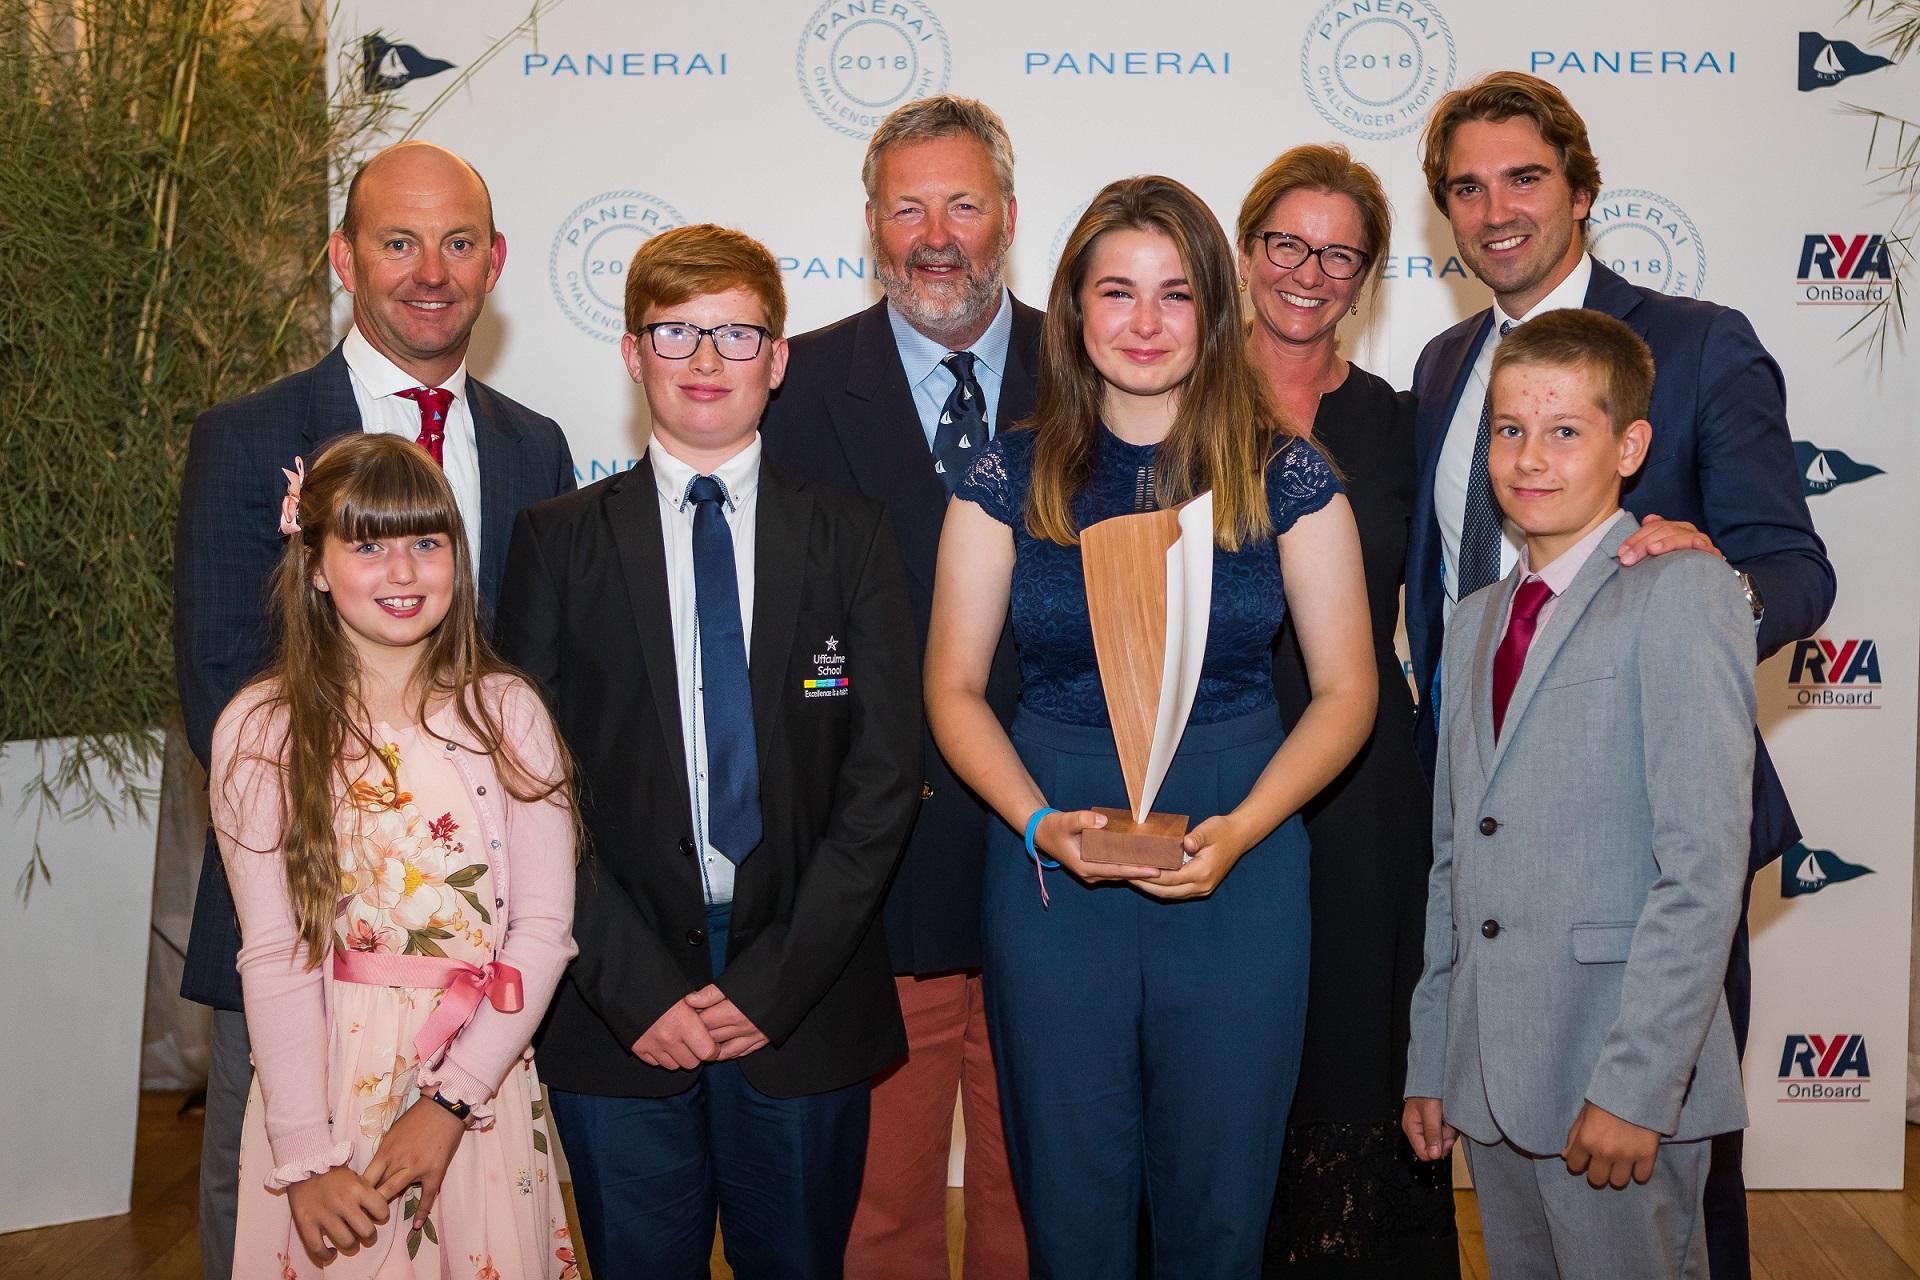 Panerai British Classic Week 2018Ph: Guido Cantini  /  Panerai